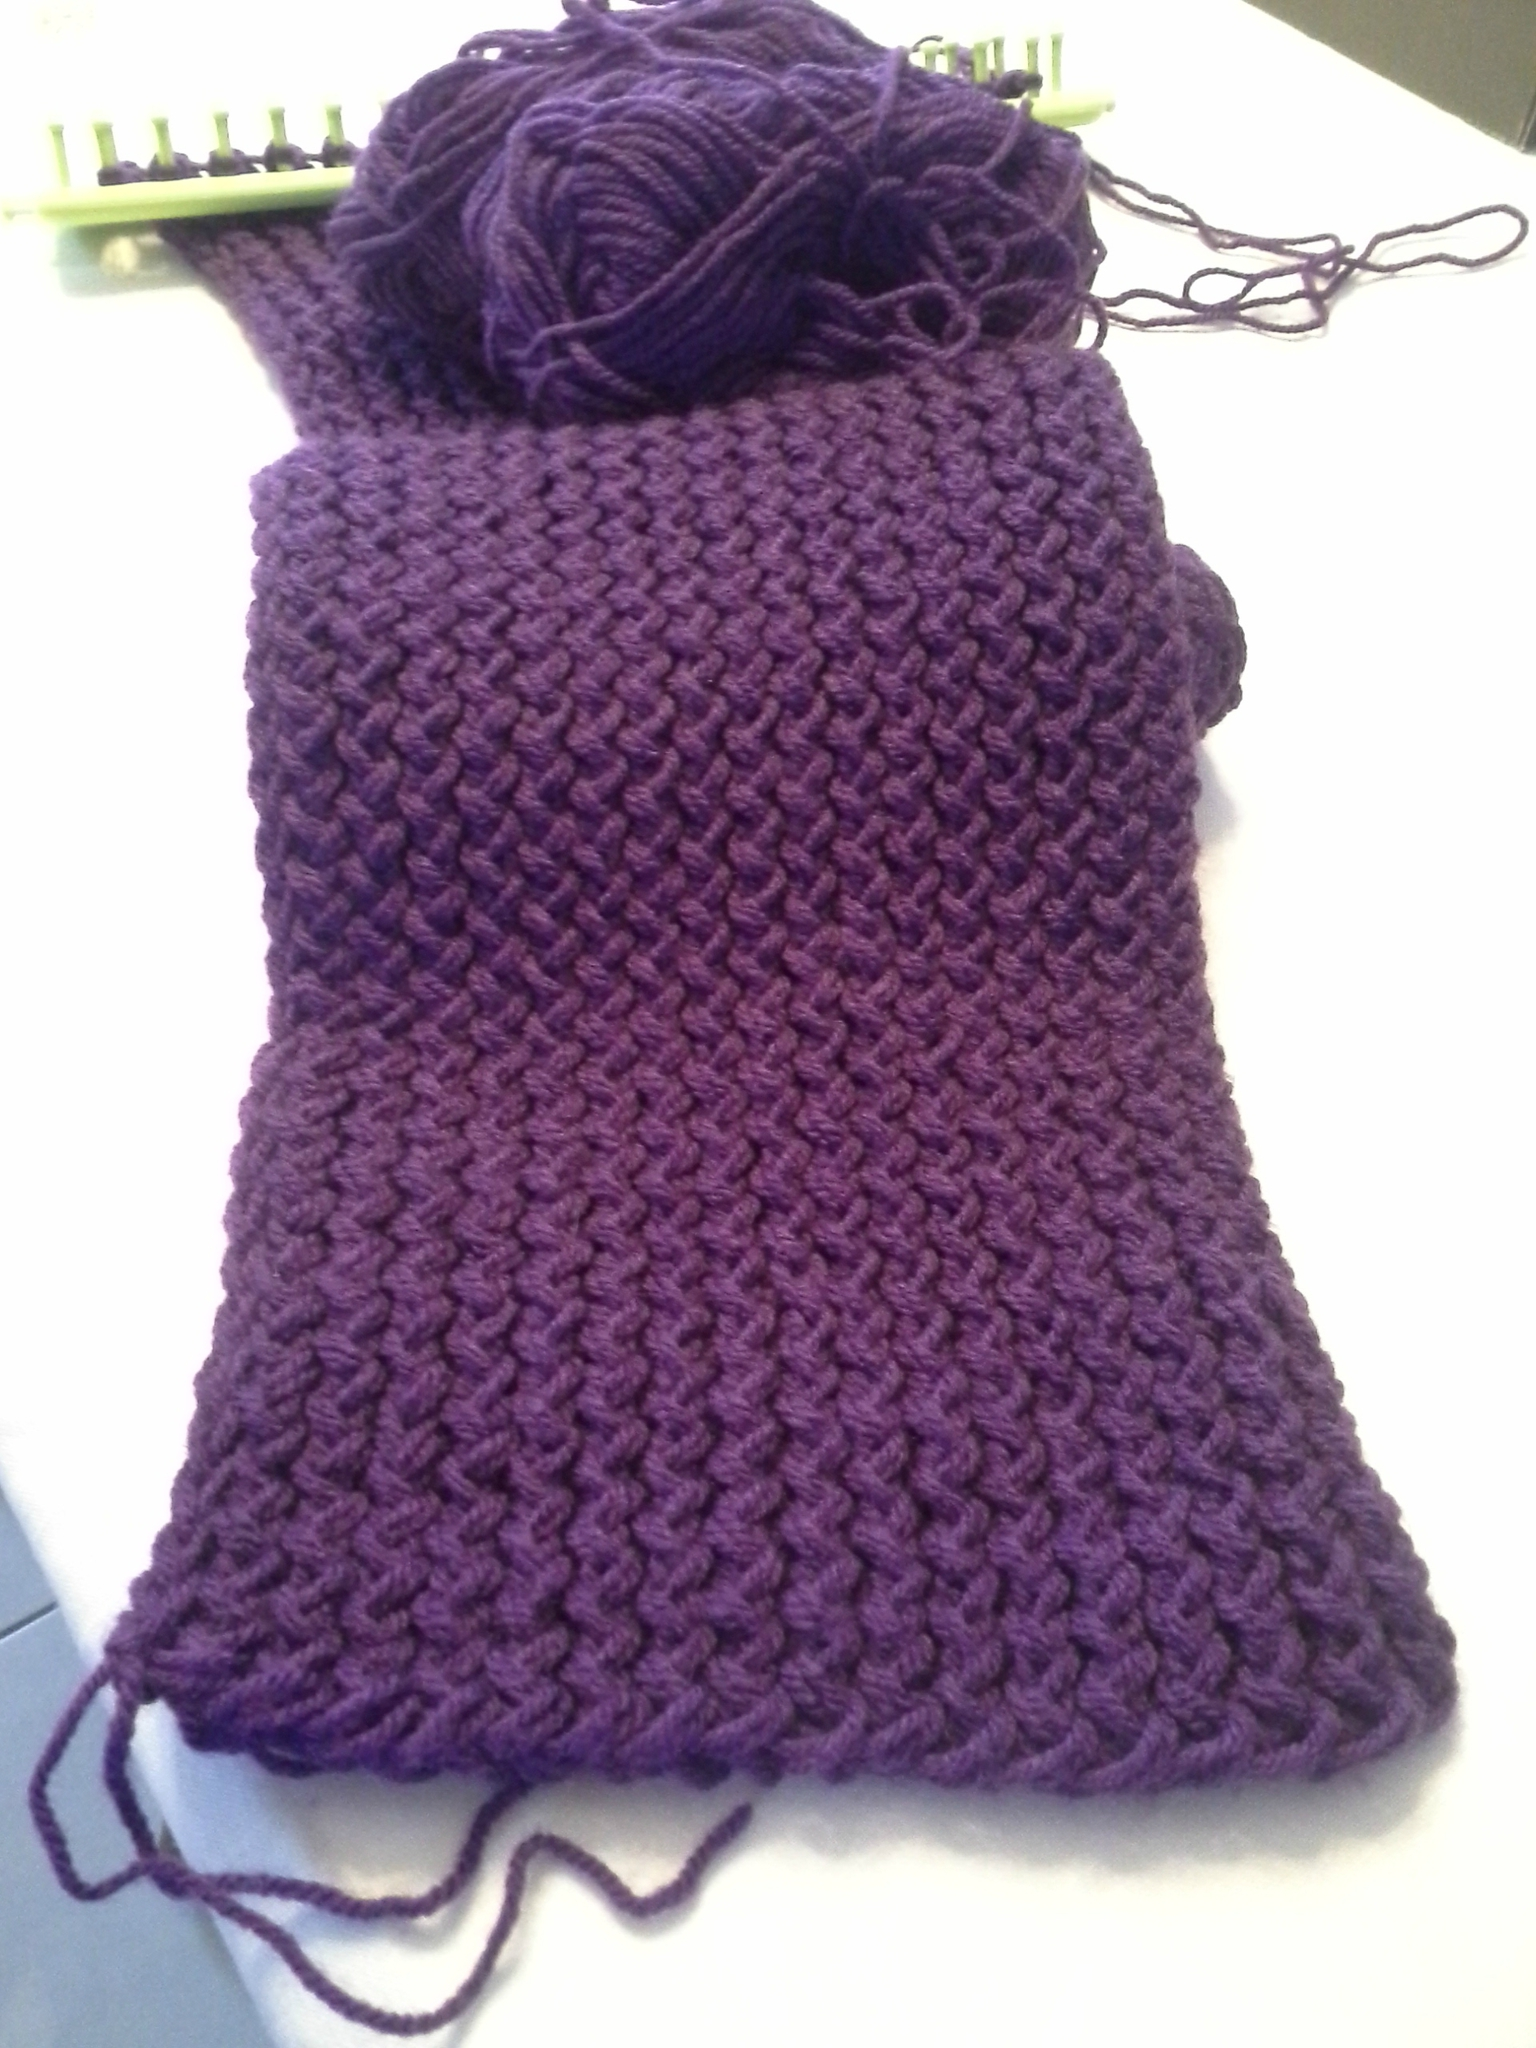 Tricotin foulard